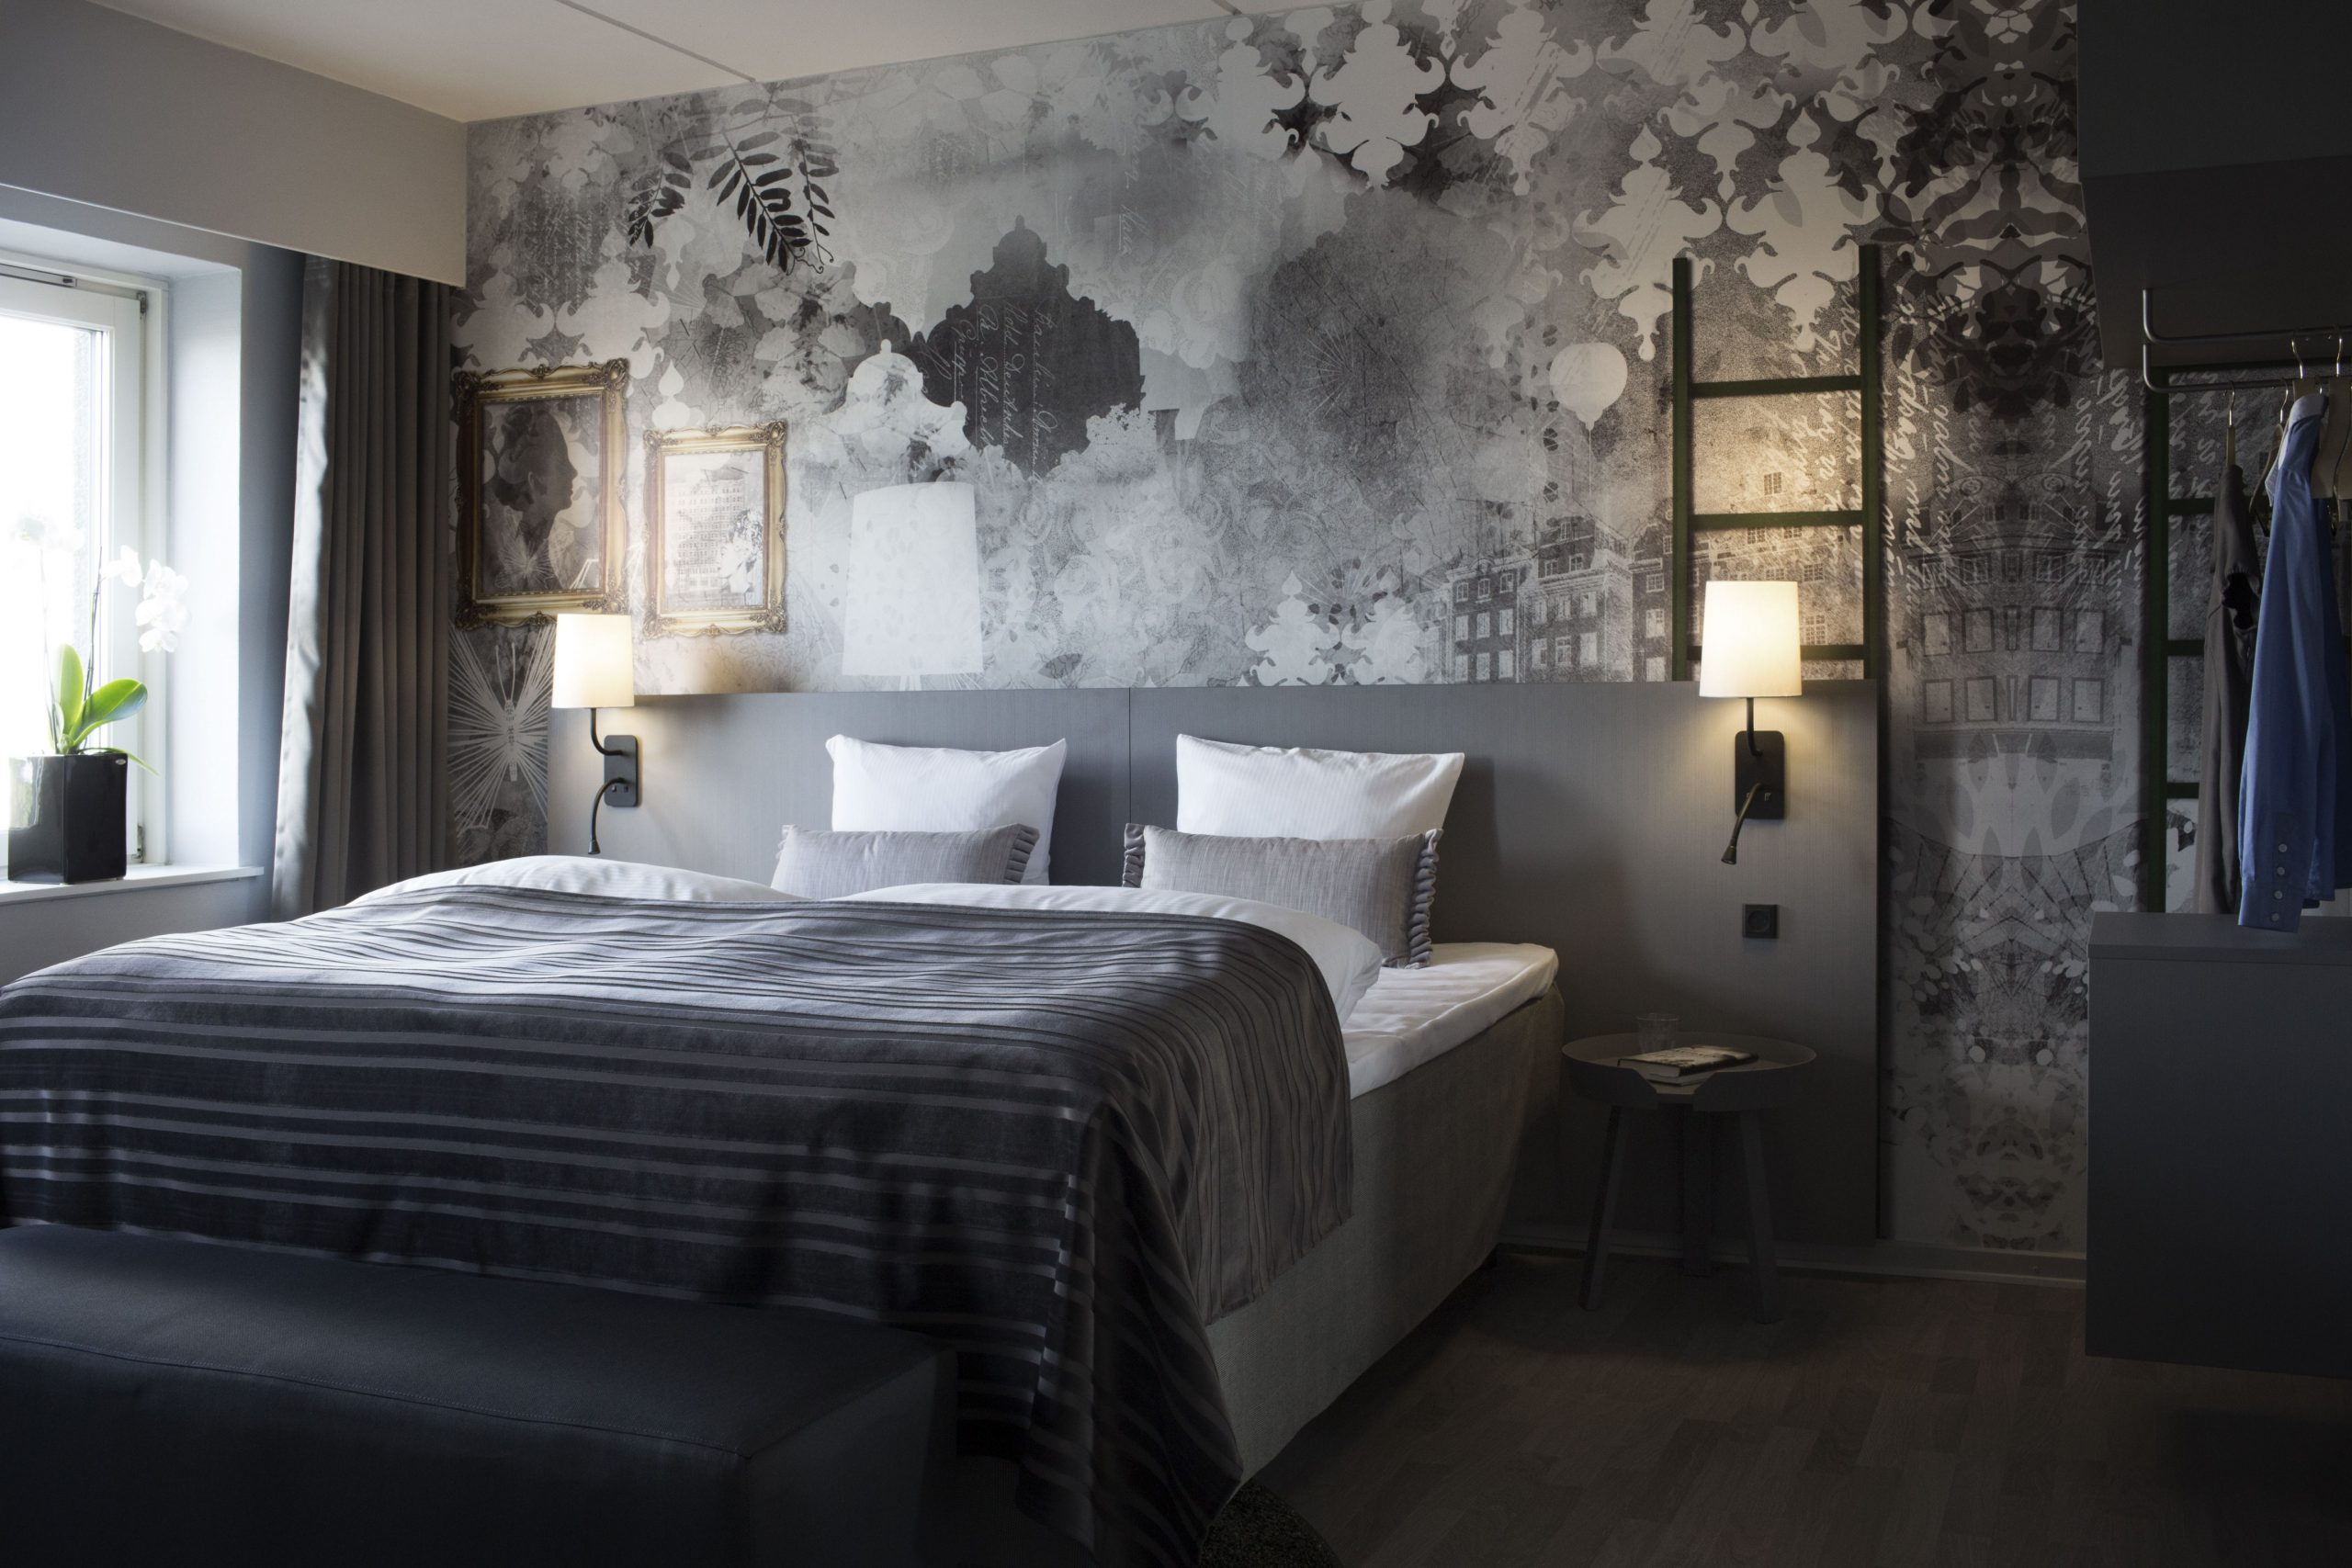 Dansk Erhverv kritiserer de store bookingportaler – blandt Dansk Erhvervs danske hotelmedlemmer er Danmarks største hotelkæde Scandic. Arkivpressefoto med et Scandic-værelse.